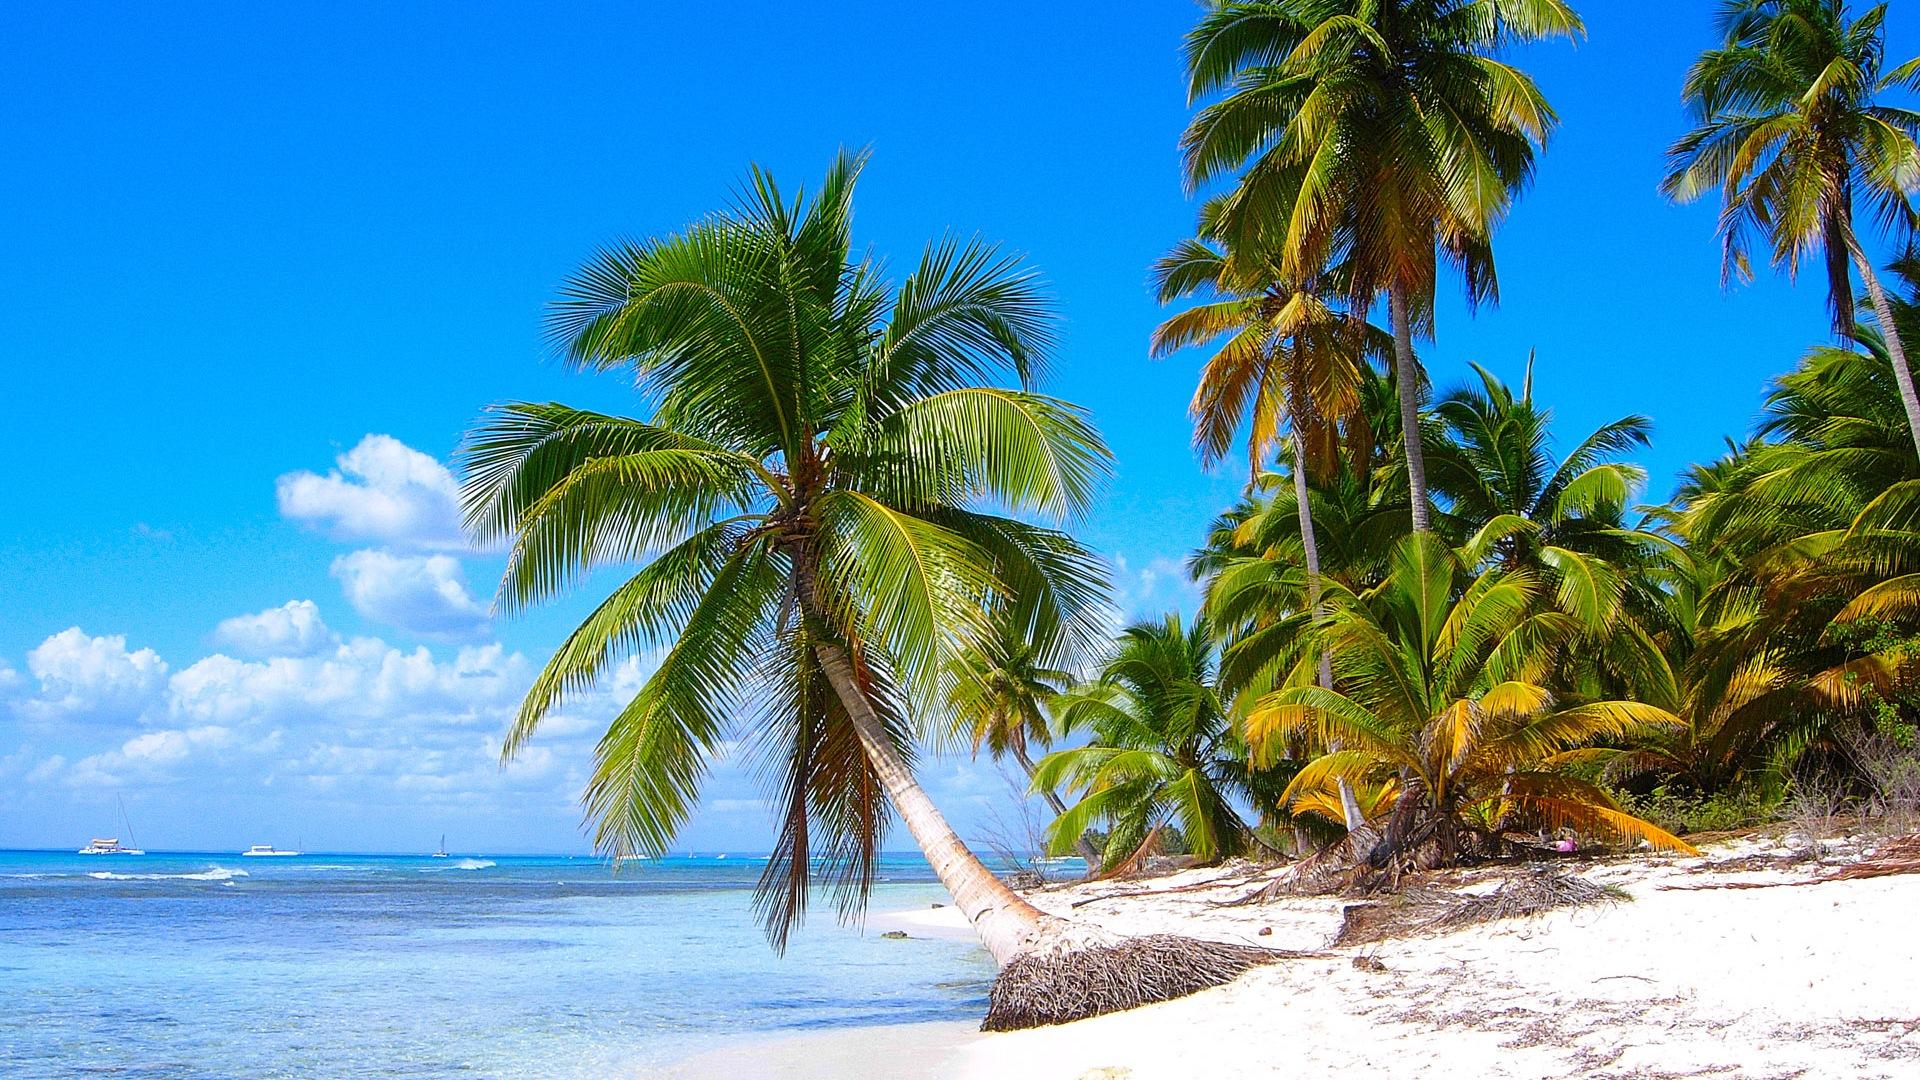 Windows 8 wallpapers caribbean shores 2 1920x1080 - Caribbean wallpaper free ...